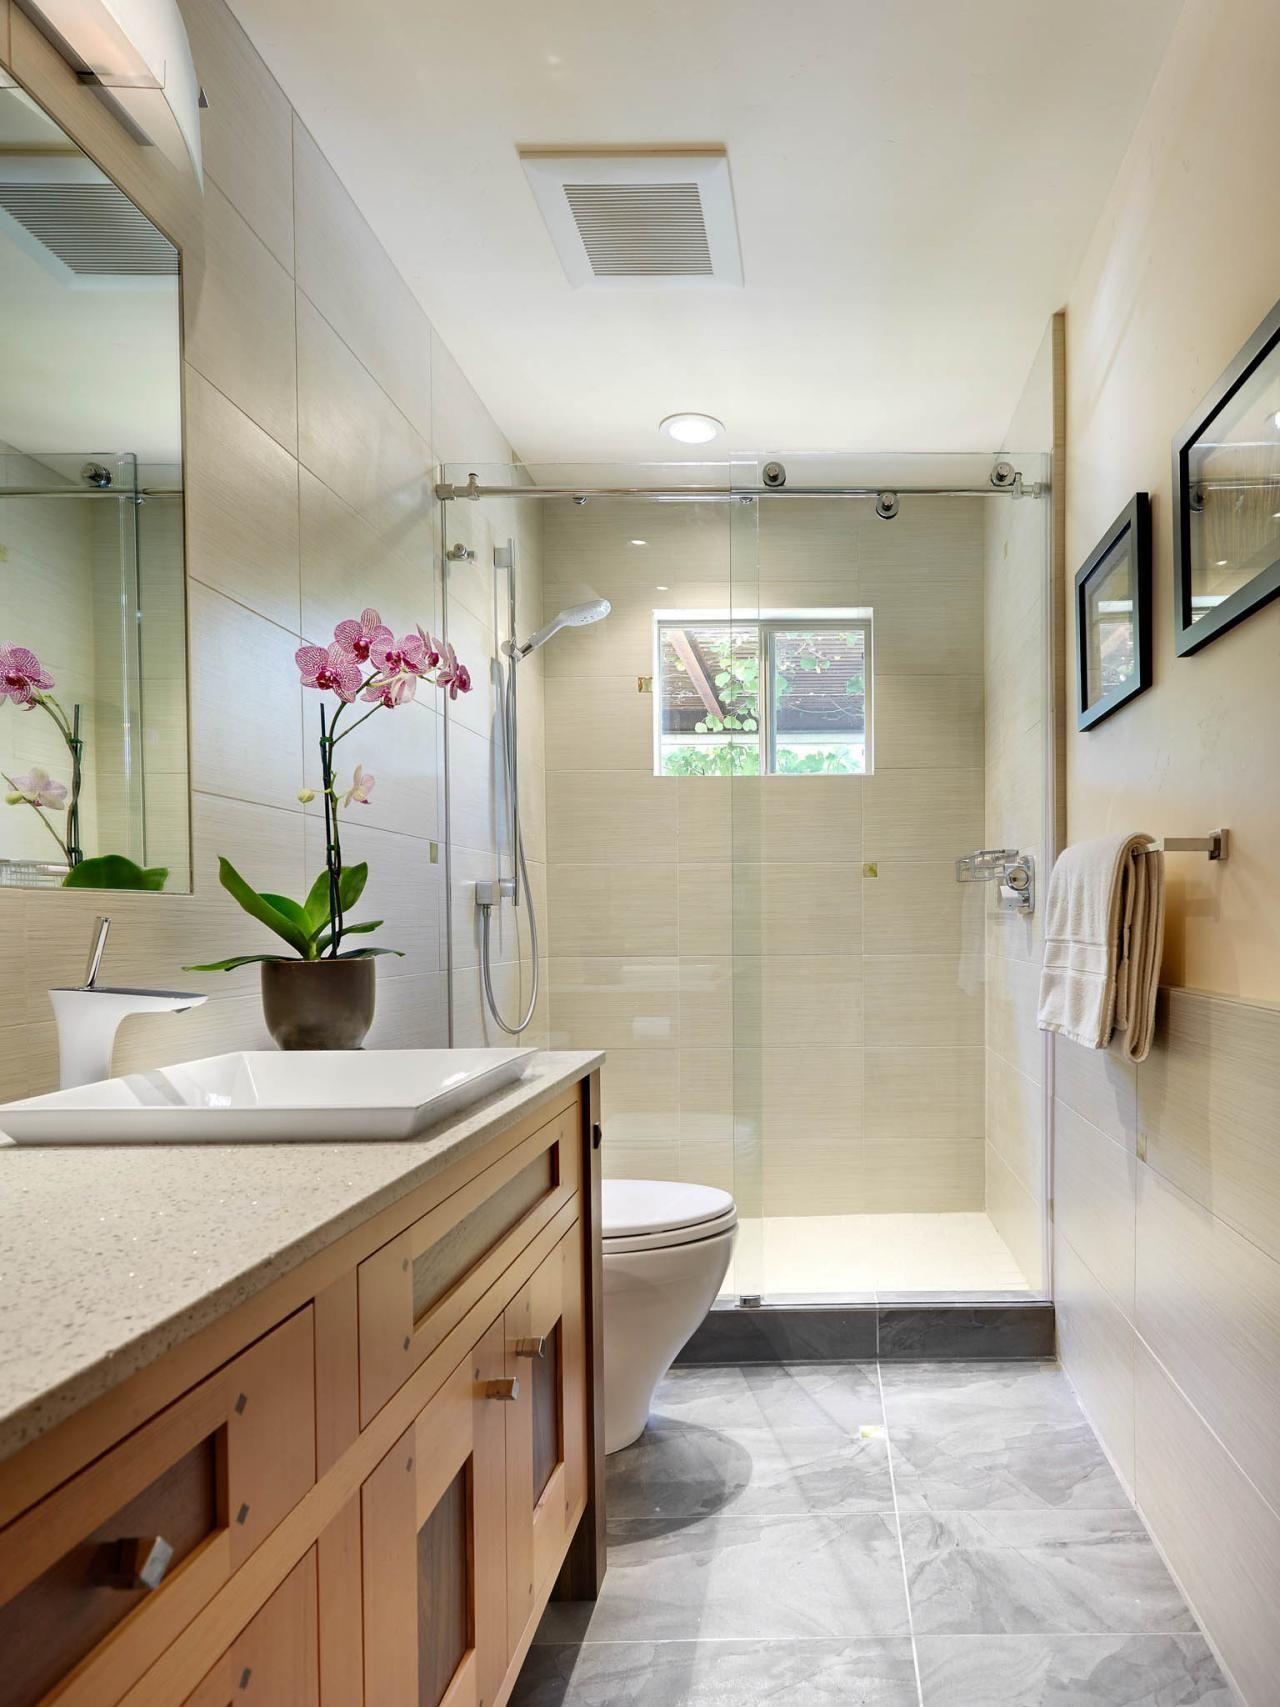 25 Ideas To Remodel Your Craftsman Bathroom | Bath design, Hgtv and ...